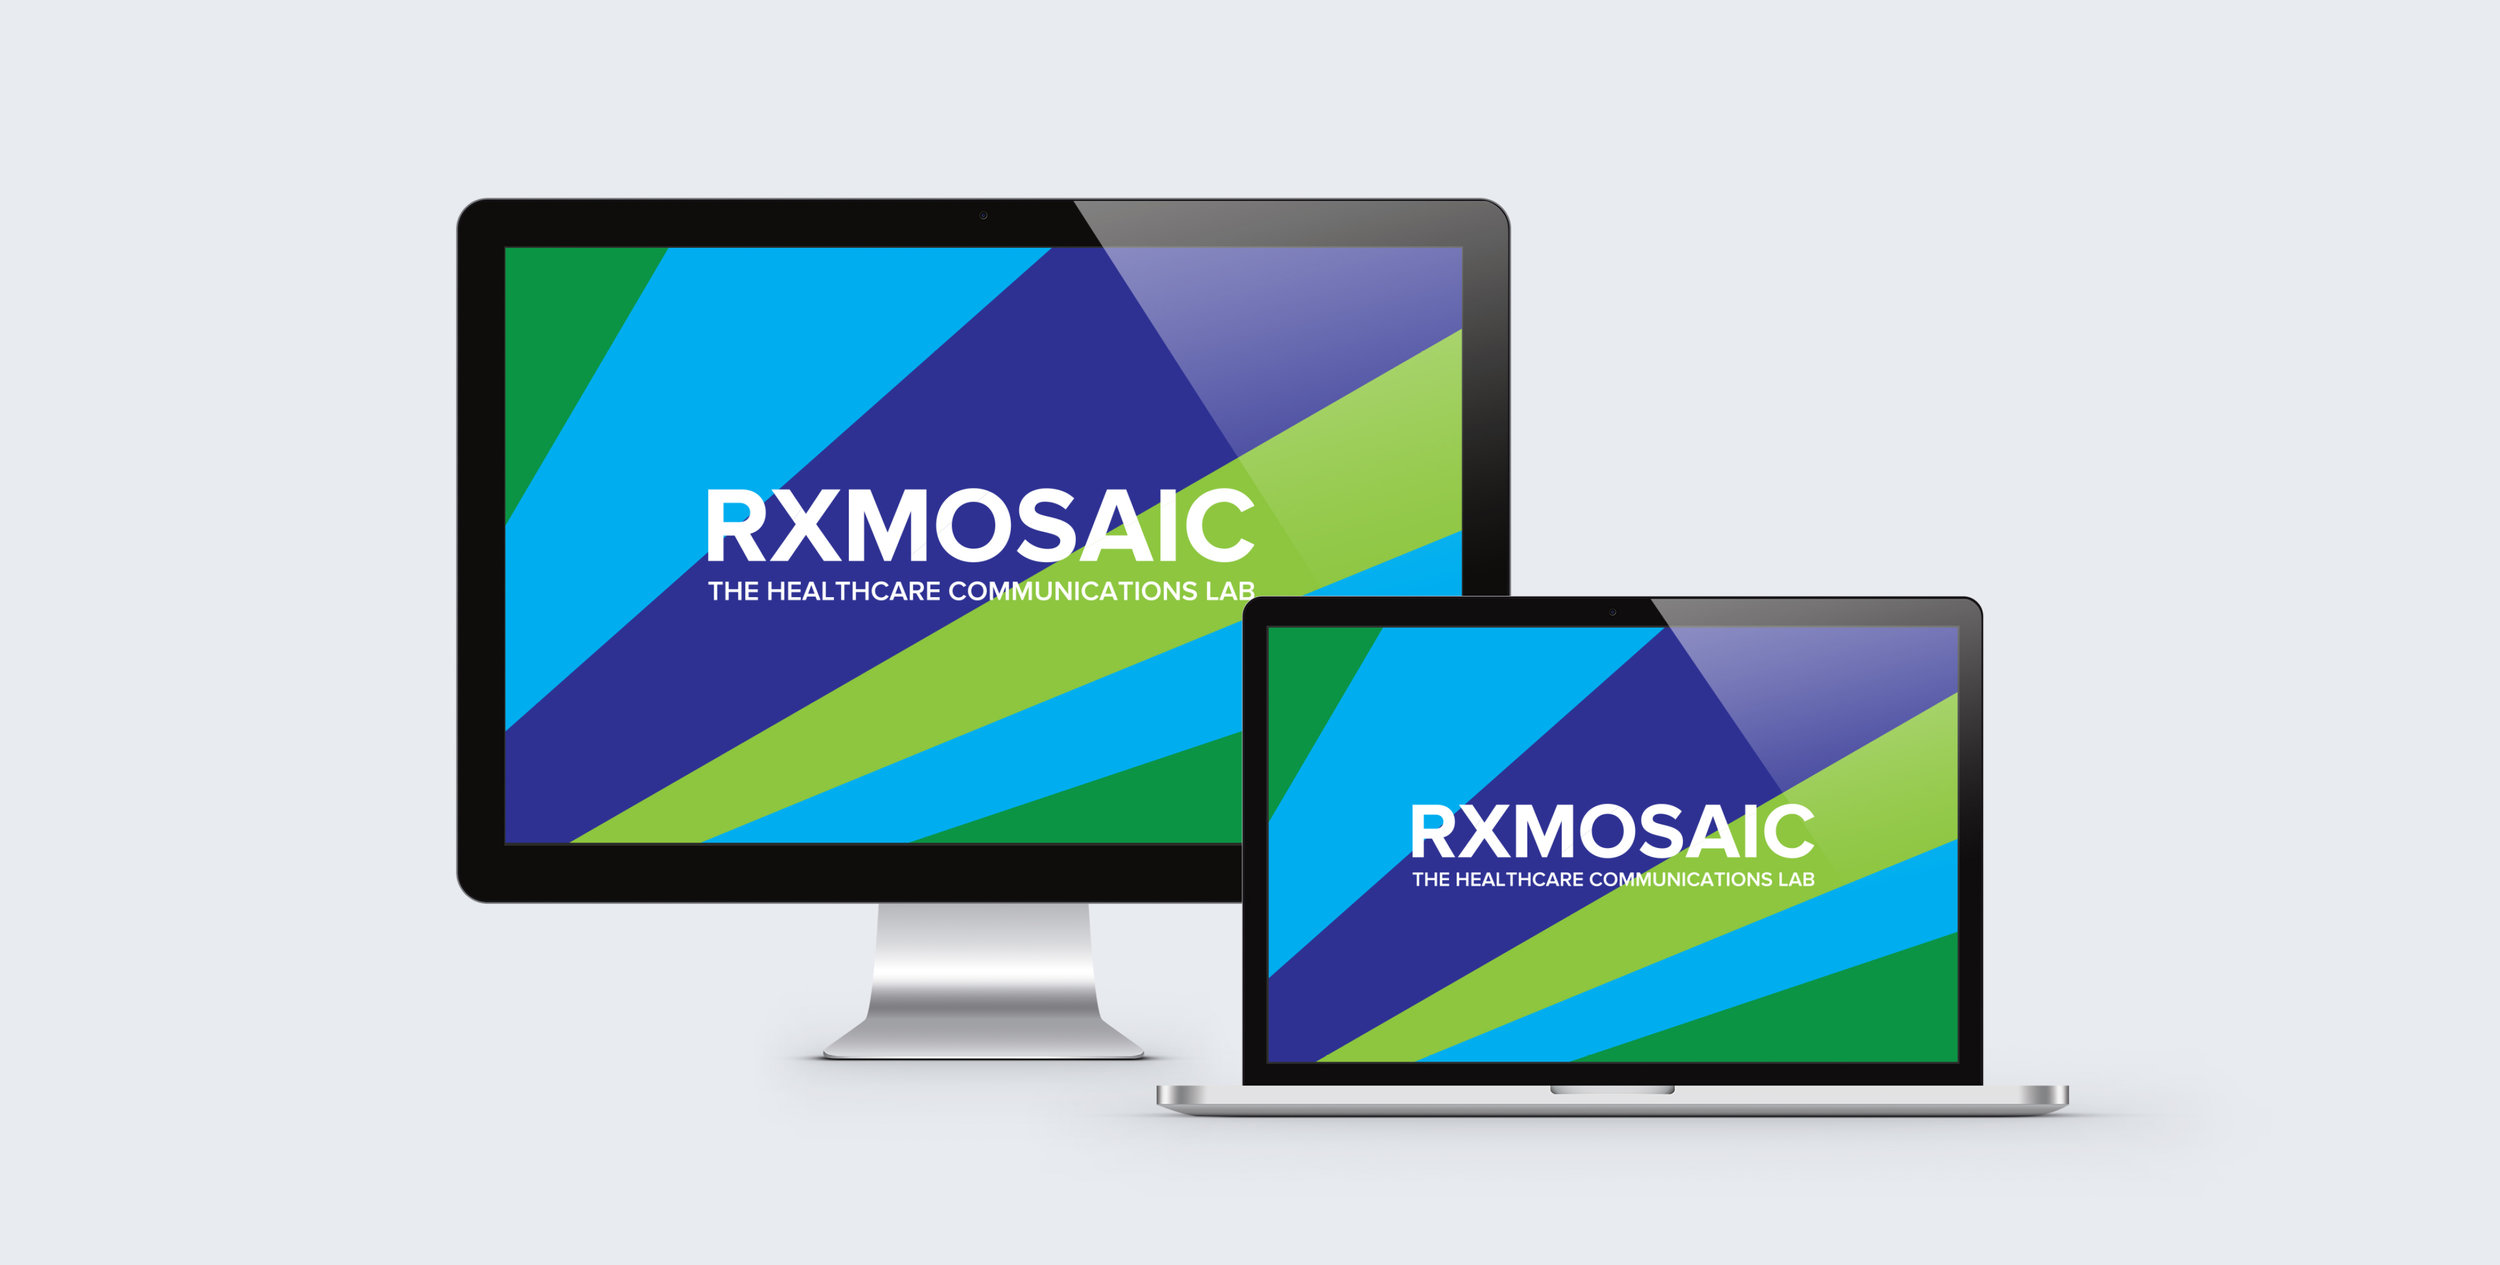 RXMOSAIC_newest2.jpg